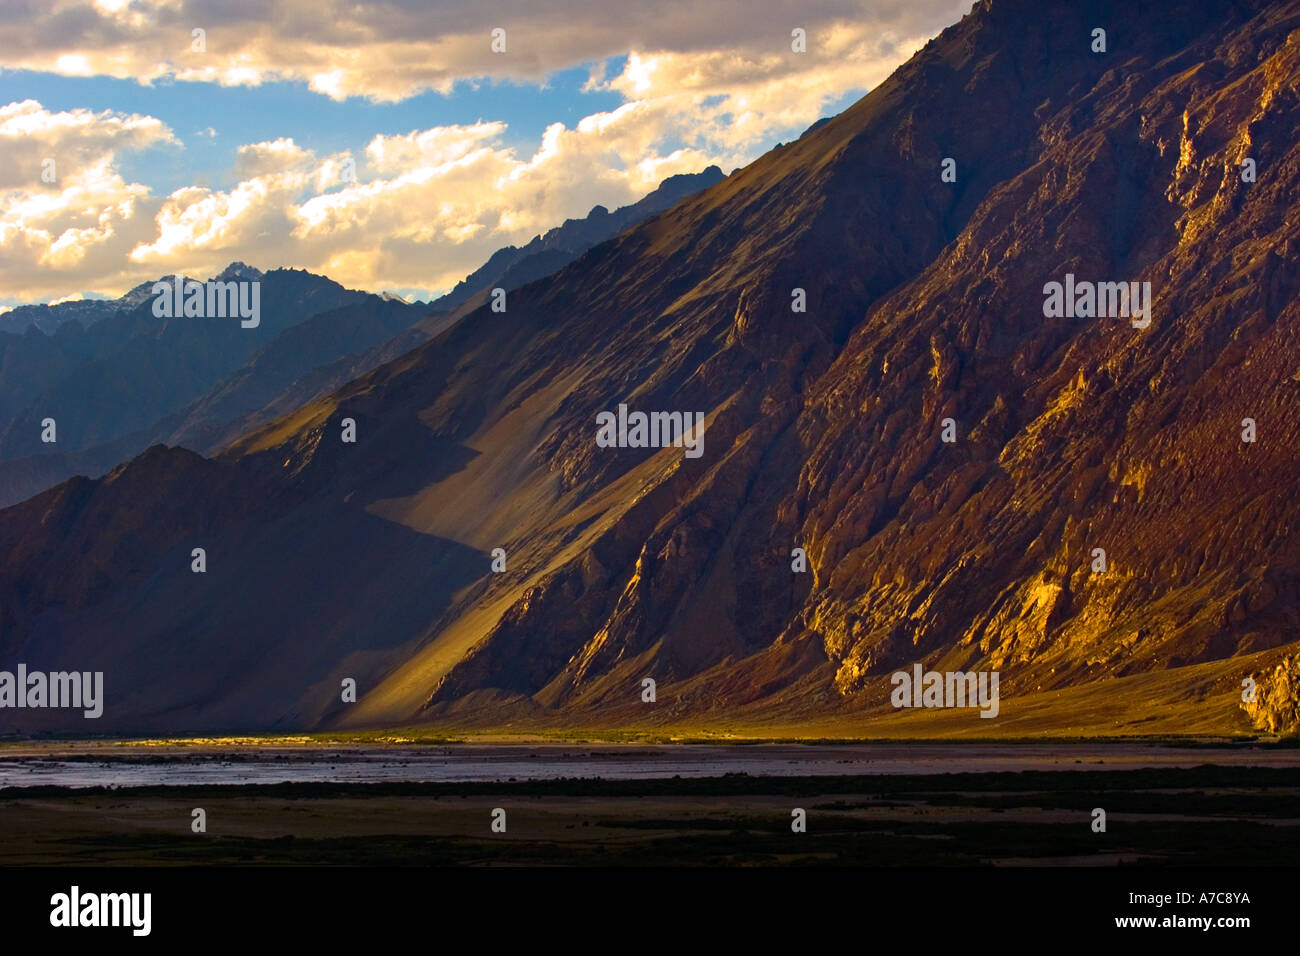 Il paesaggio intorno a Diskit Gompa Diskit Himalaya indiano Immagini Stock